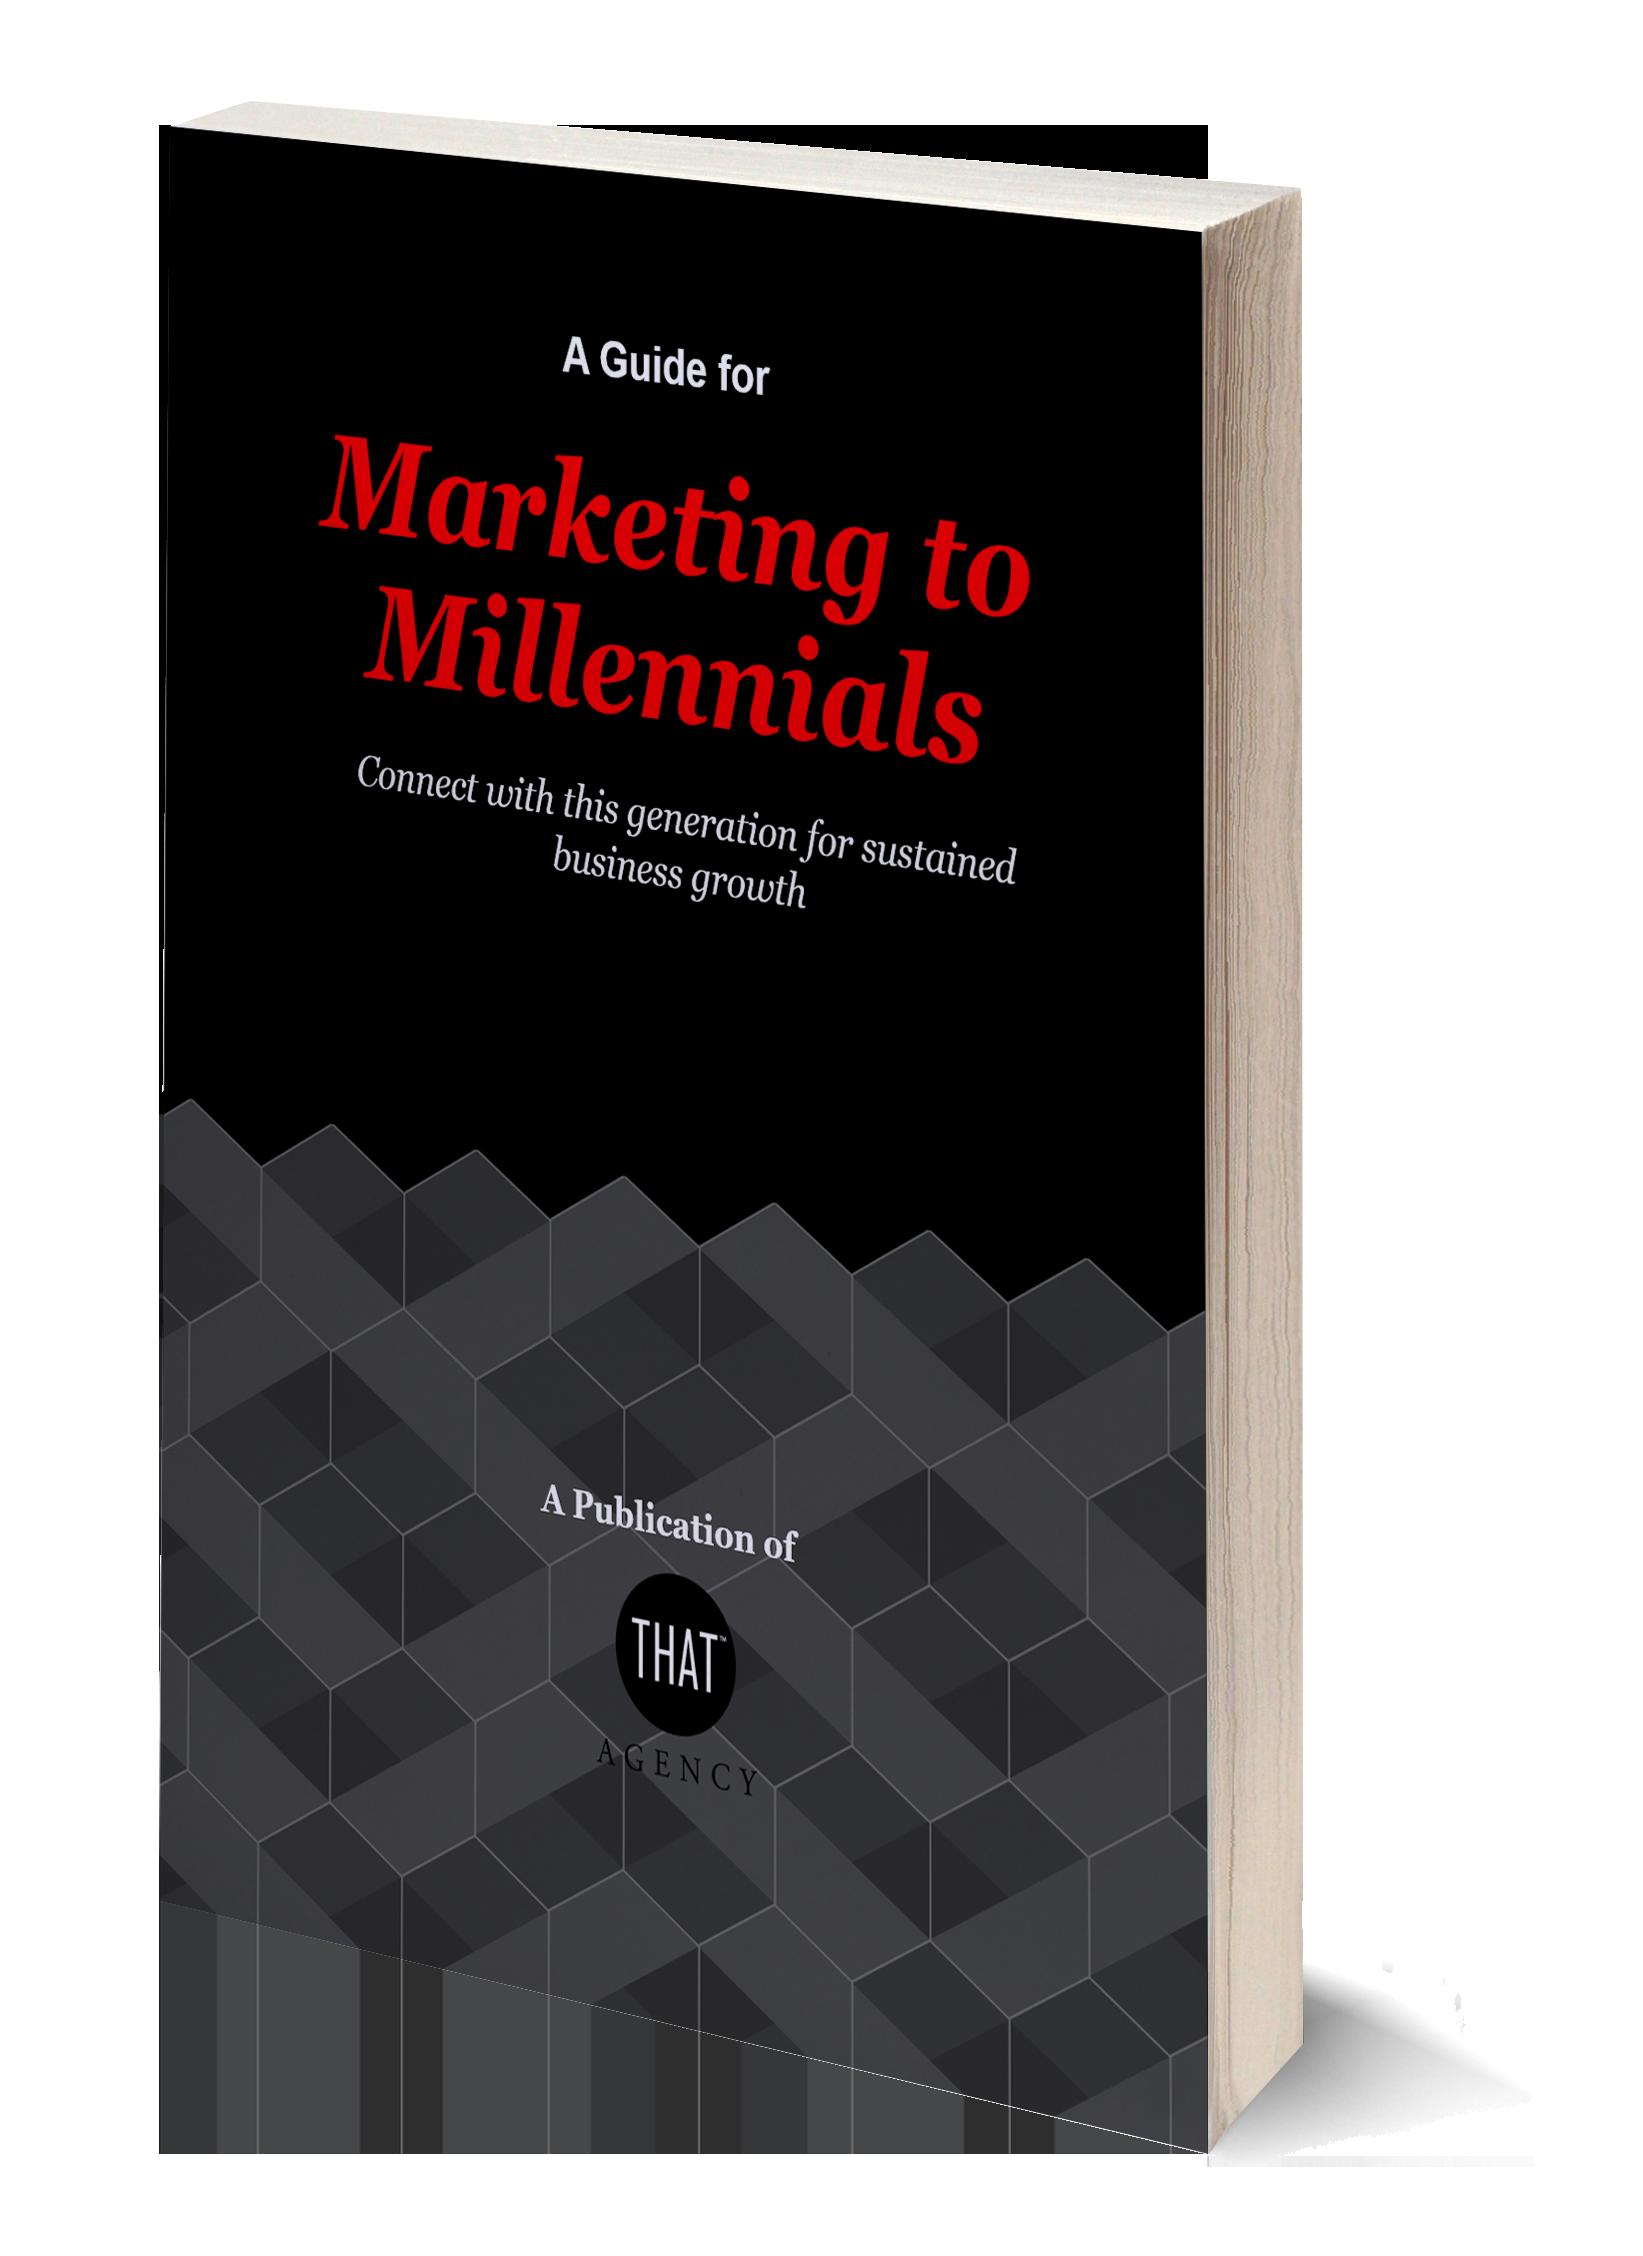 Millennial Marketing | THAT Agency